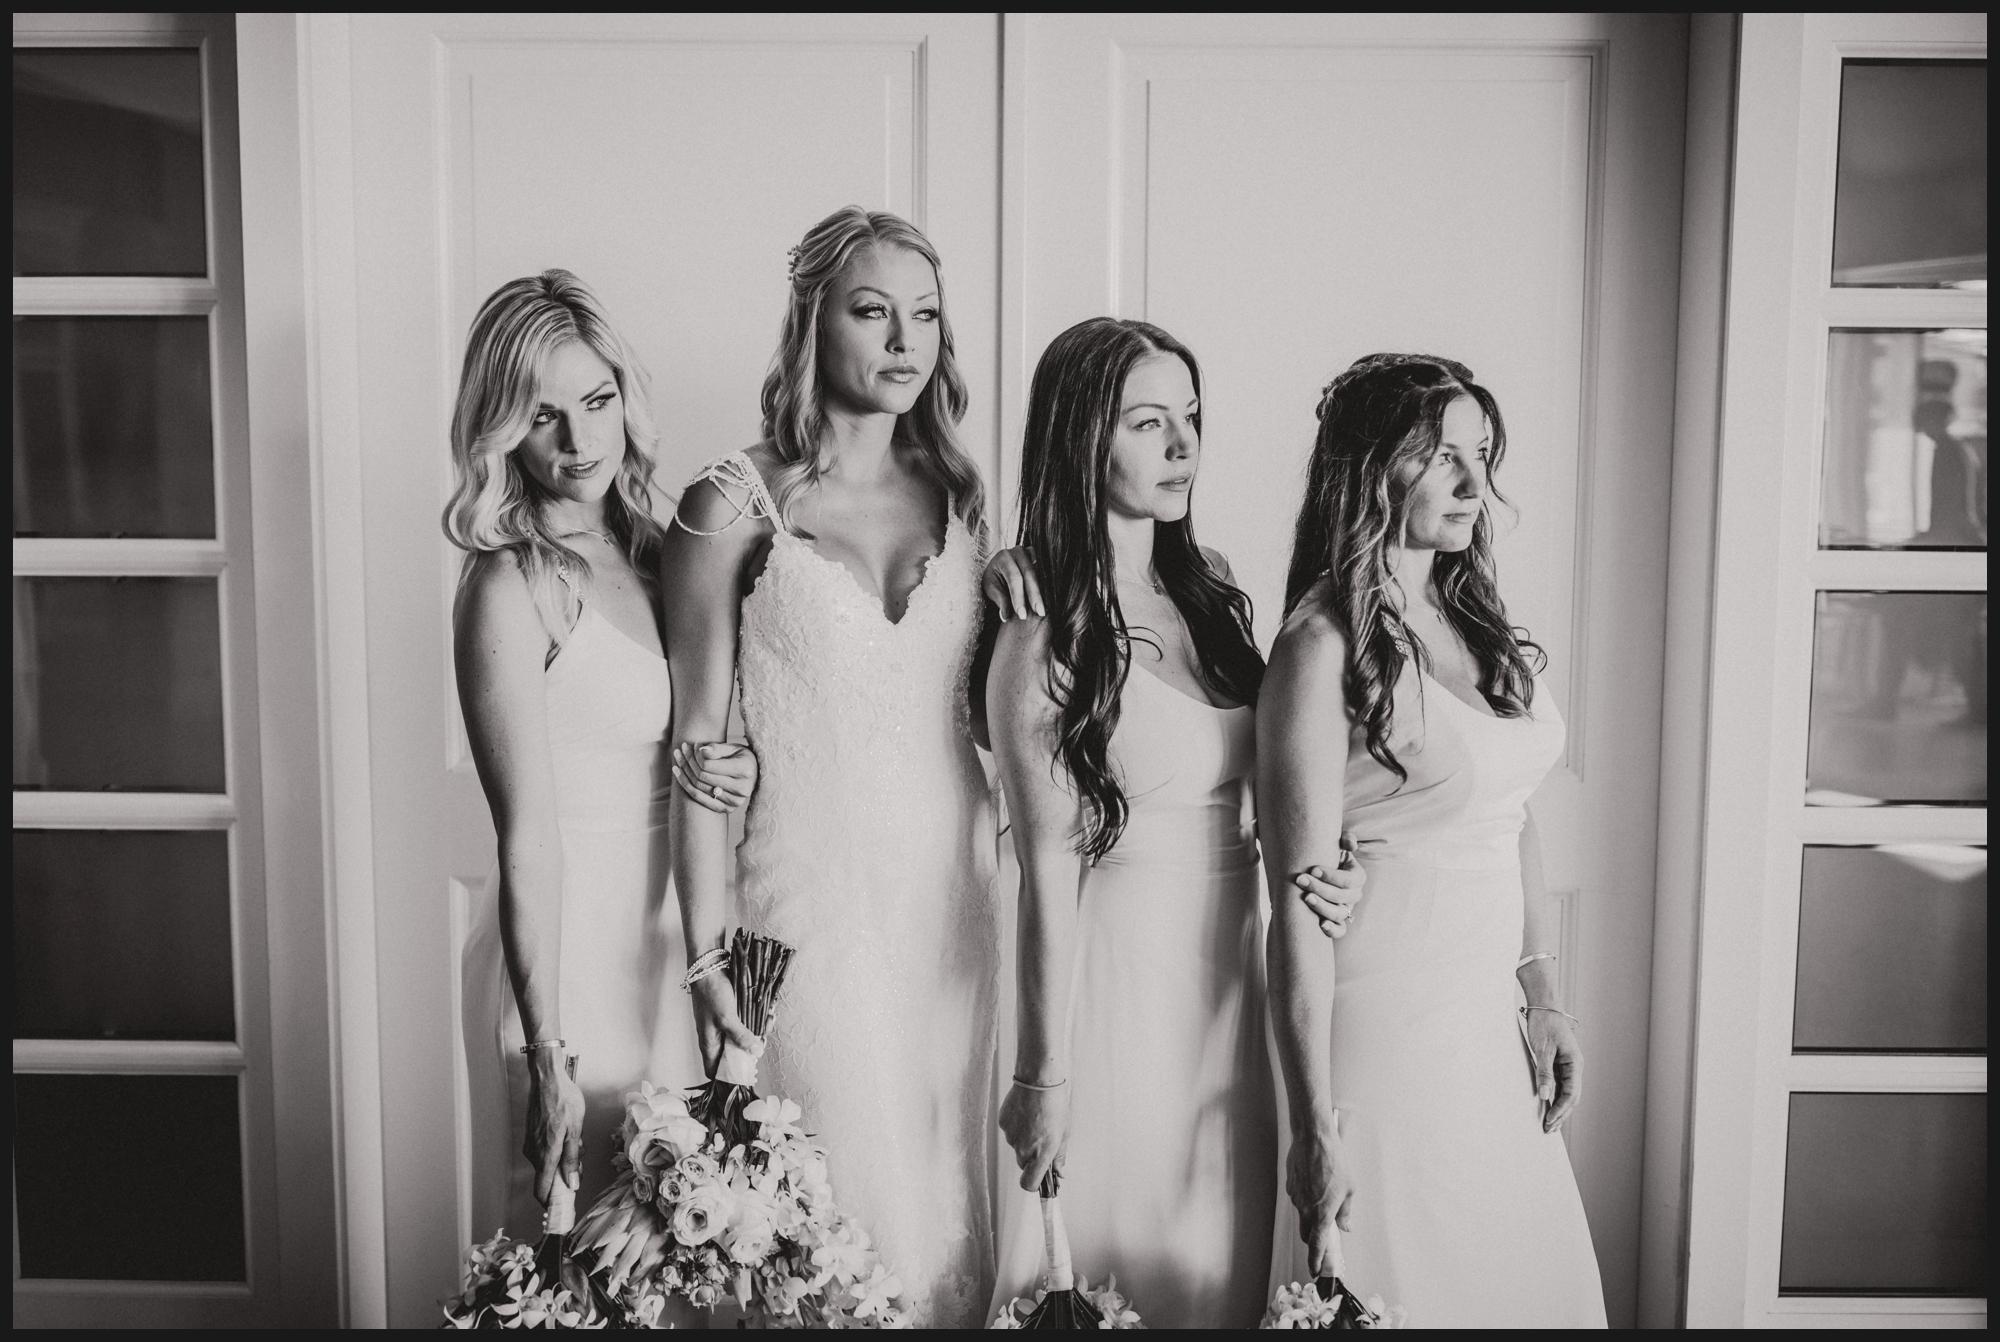 Orlando-Wedding-Photographer-destination-wedding-photographer-florida-wedding-photographer-hawaii-wedding-photographer_0048.jpg